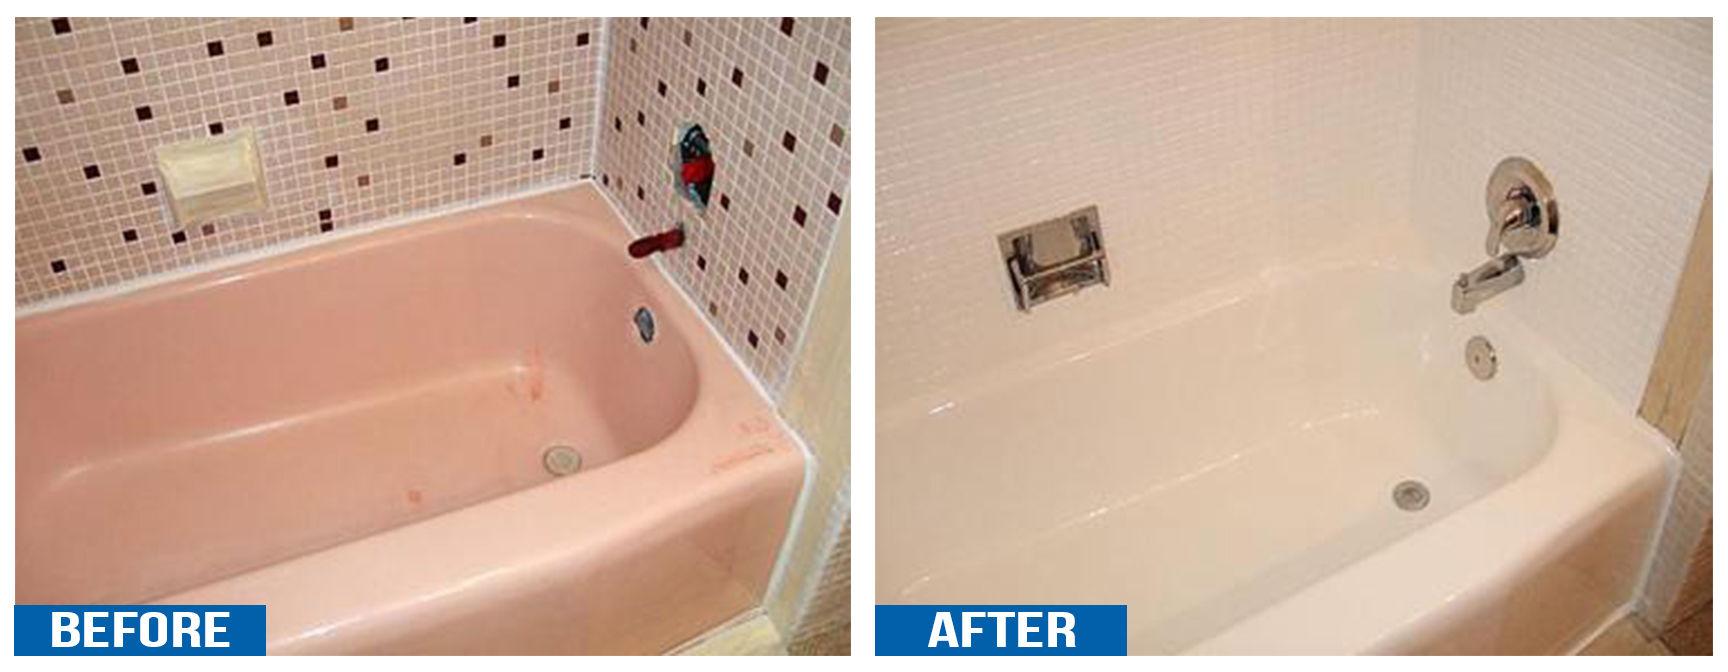 Nice Painting A Tub Tiny Bathroom Refinishers Clean Refinishing Reglazing Bathroom Youthful Bath Refinishers PinkRefinish Clawfoot Tub Cost Miracle Method Of S. WI, Inc. | Bathtubs | Tubs | McFarland, WI ..